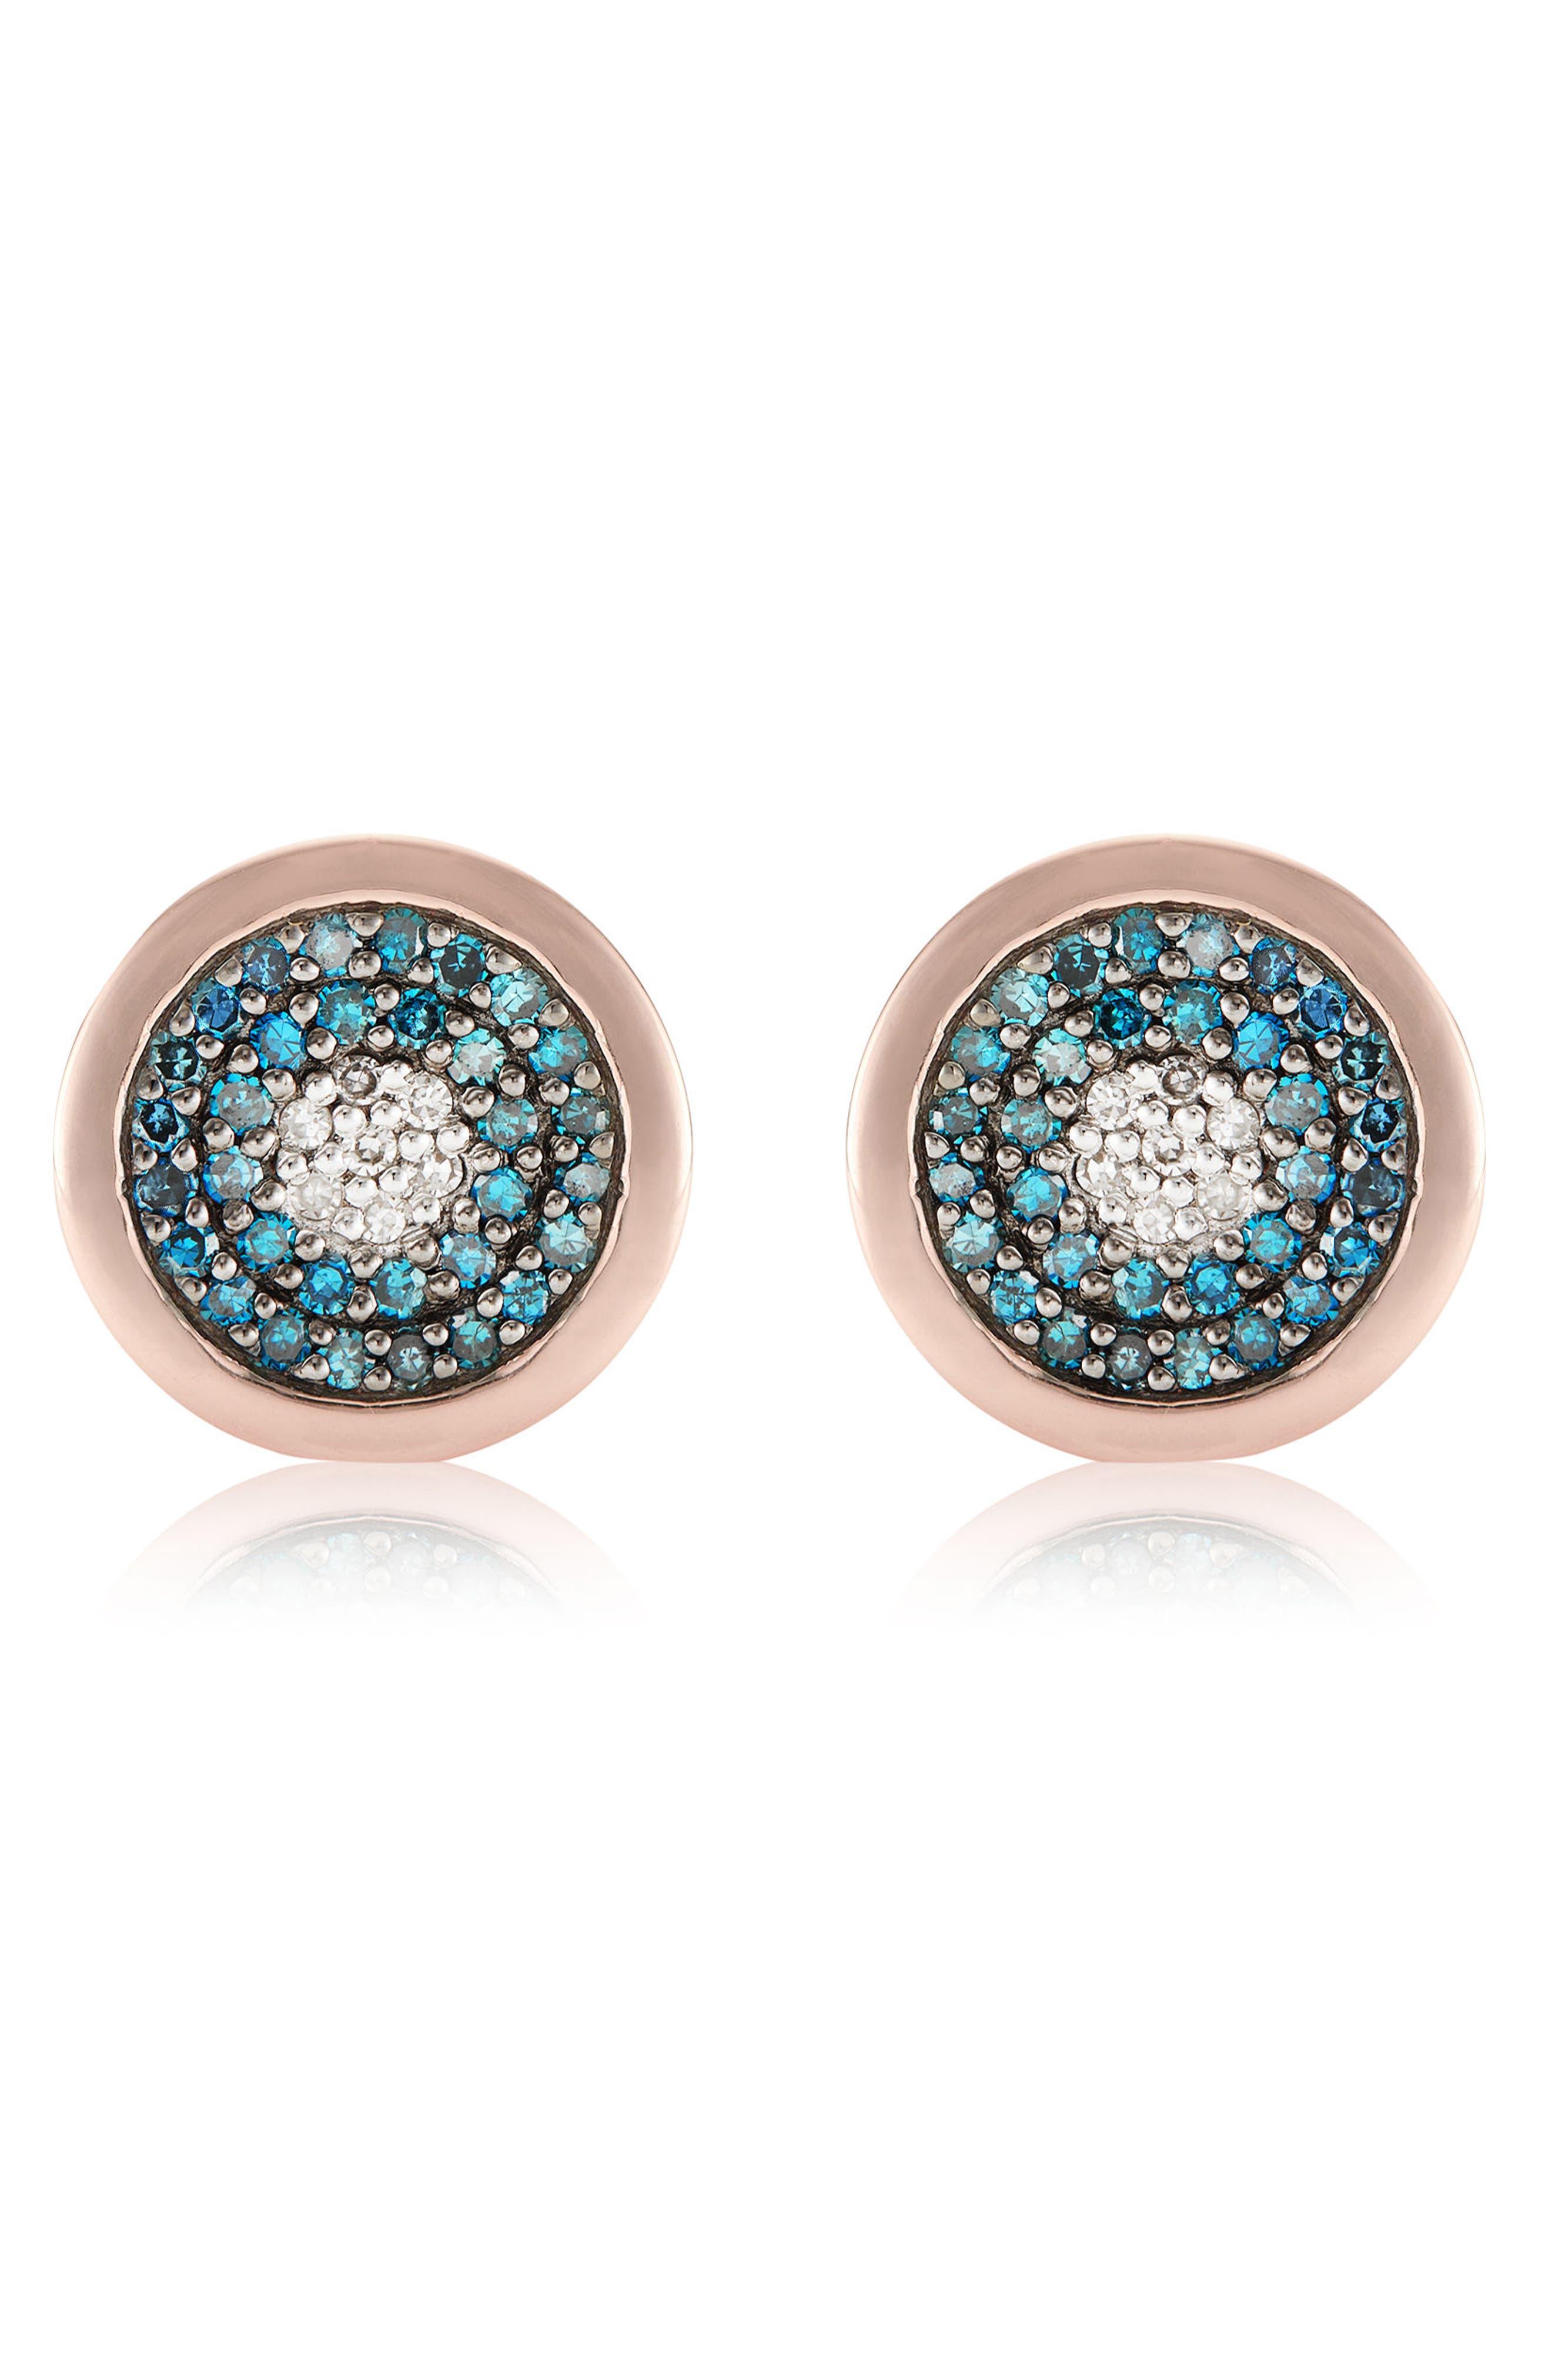 Evil Eye Stud Diamond Earrings,                             Main thumbnail 1, color,                             ROSE GOLD/ BLUE DIAMOND